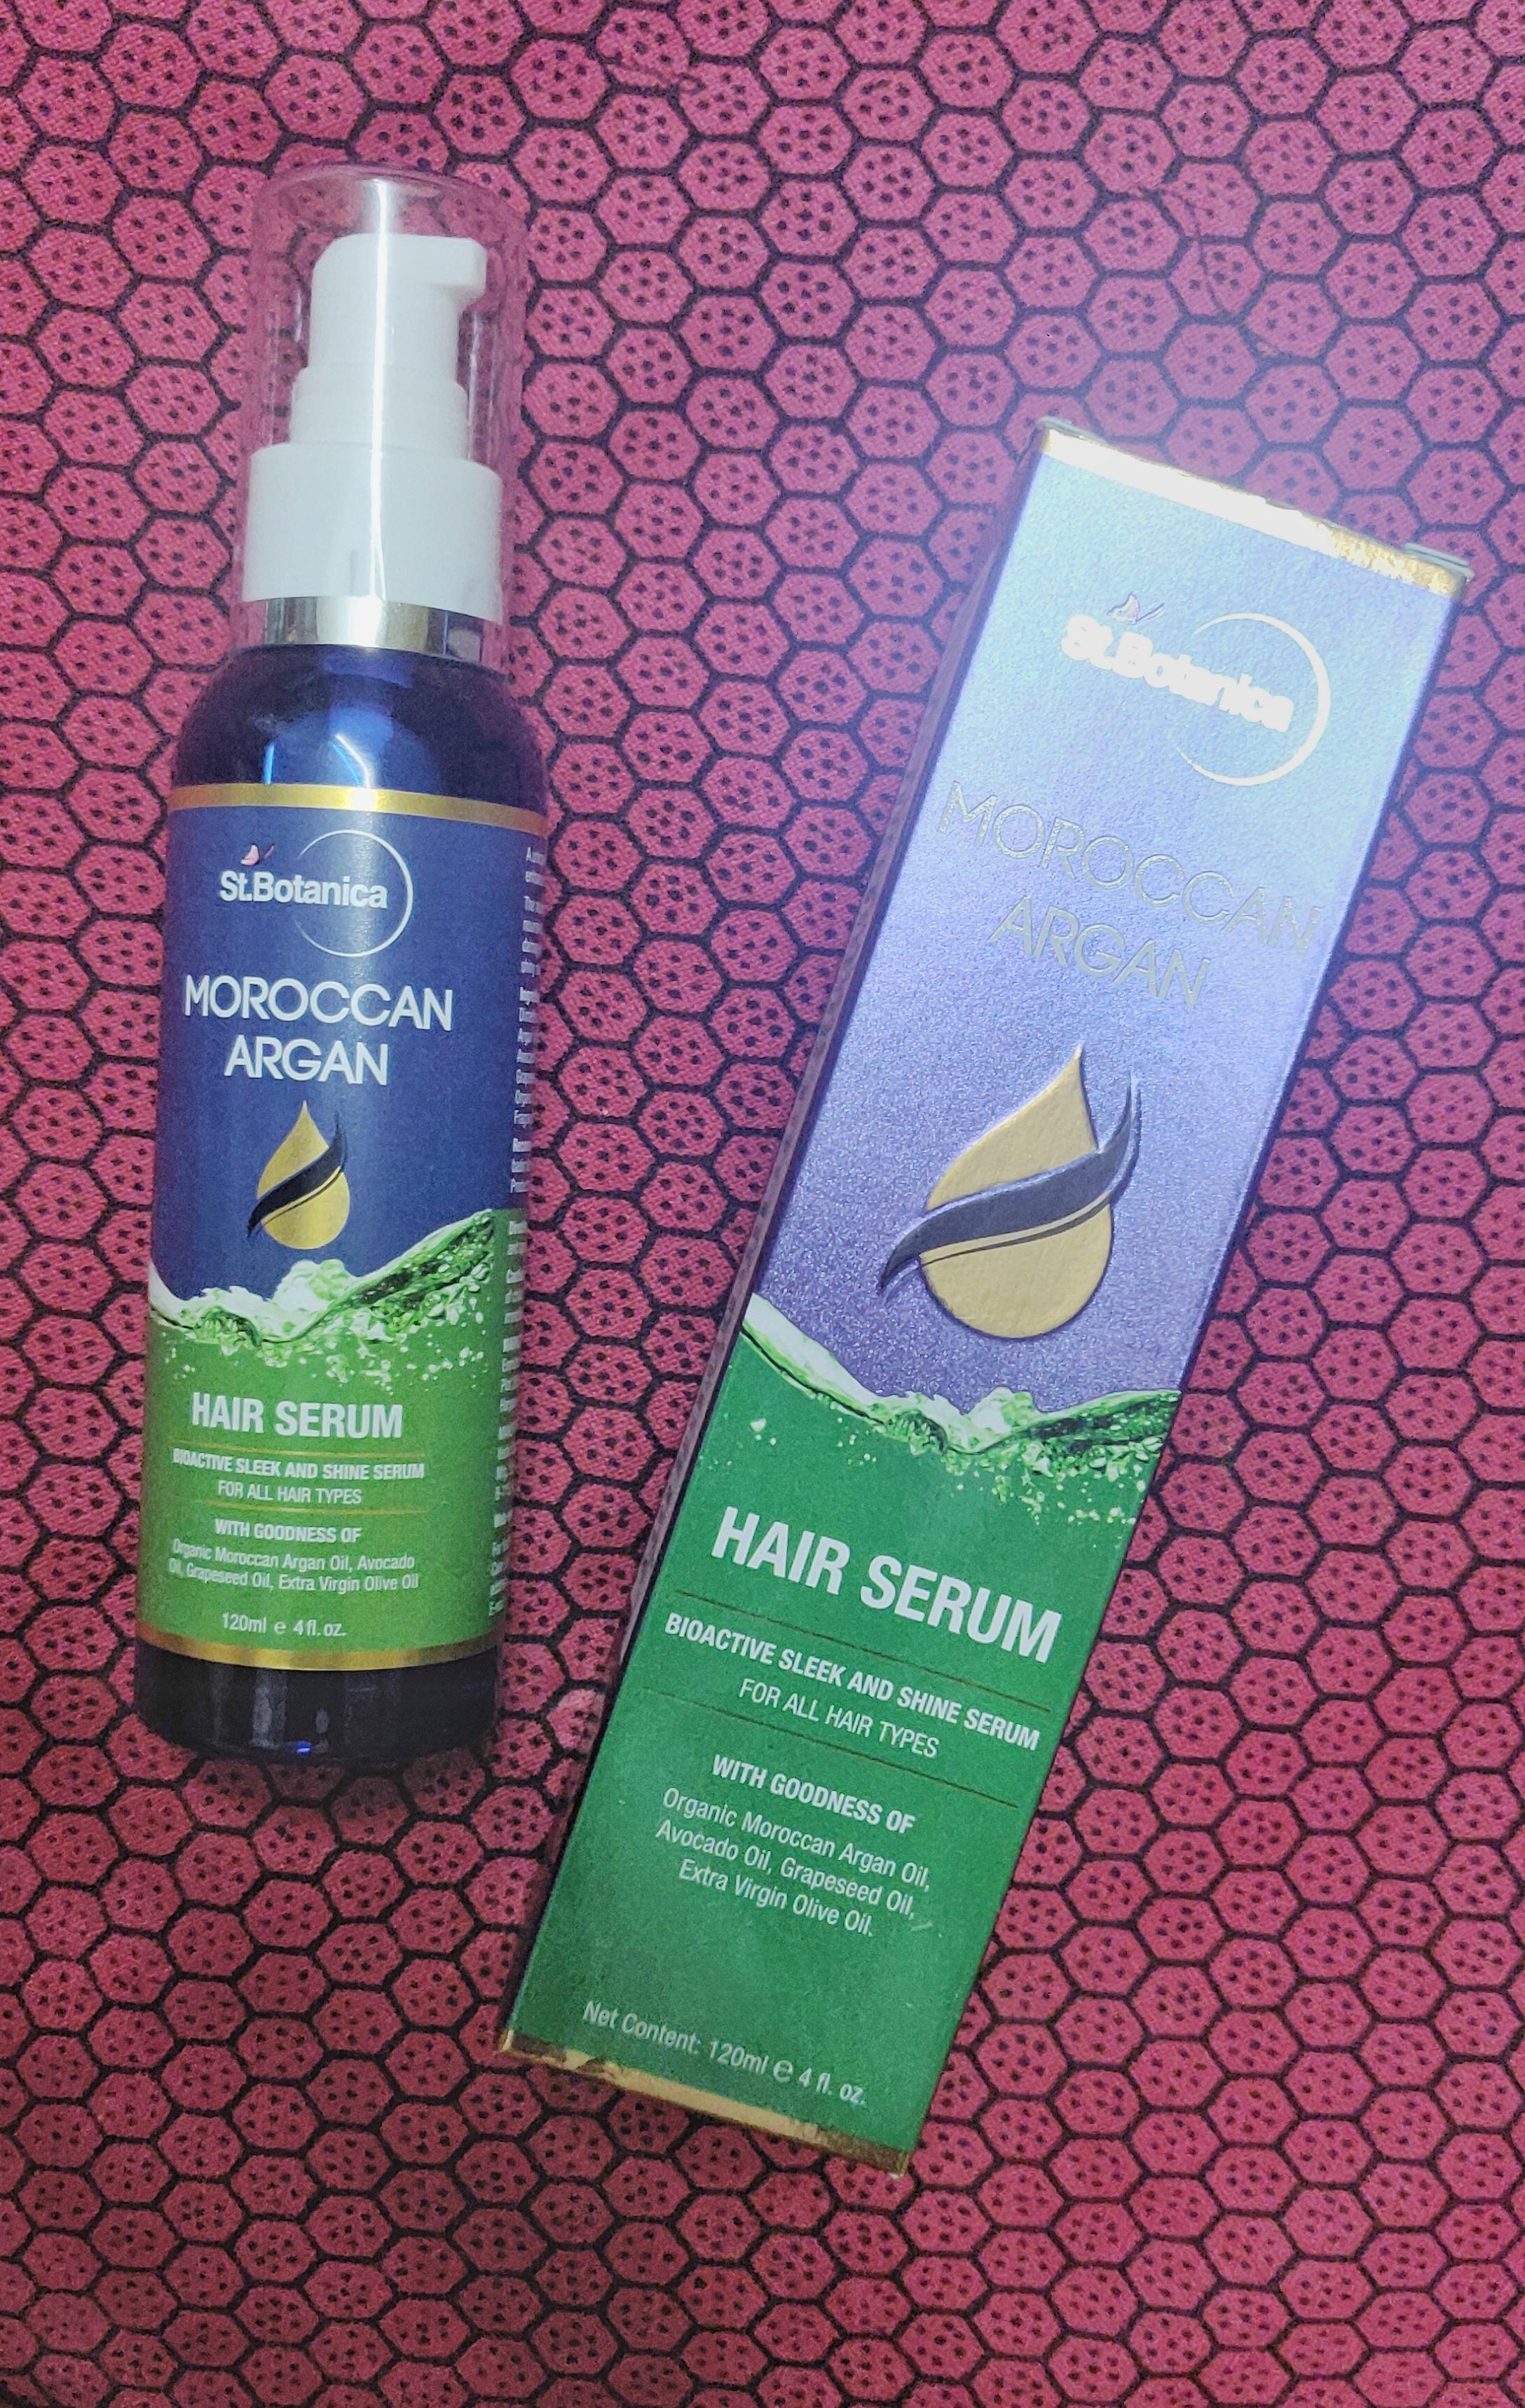 St.Botanica Moroccan Argan Hair Serum pic 1-Helped taming my frizzy hair-By reeni_padmaja